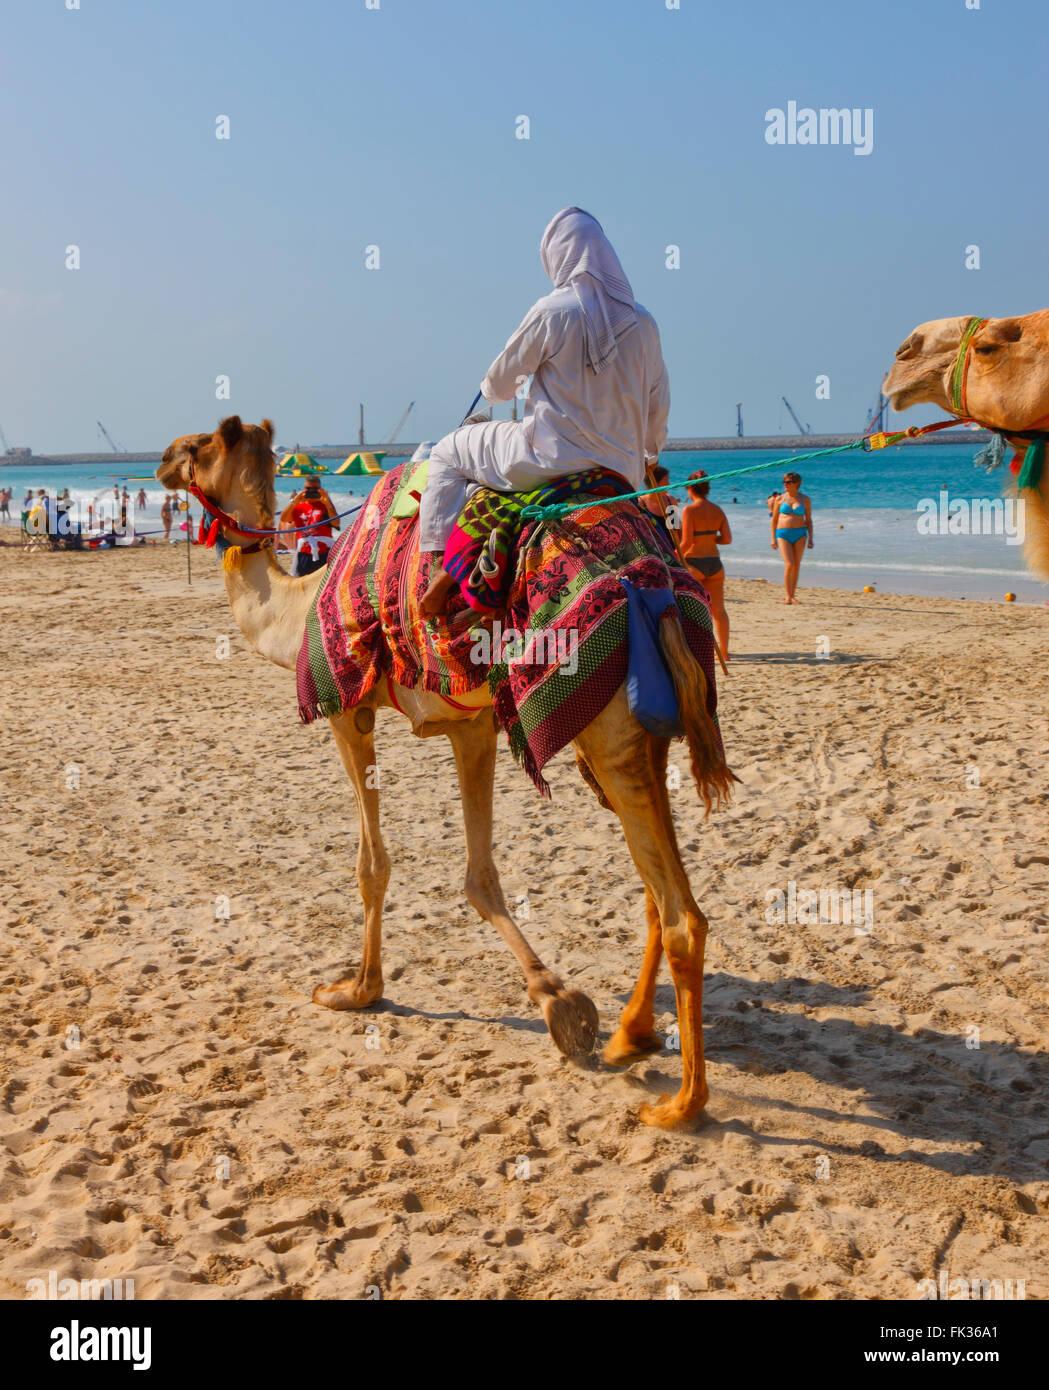 Camel on the Jumeirah beach, Dubai - Stock Image